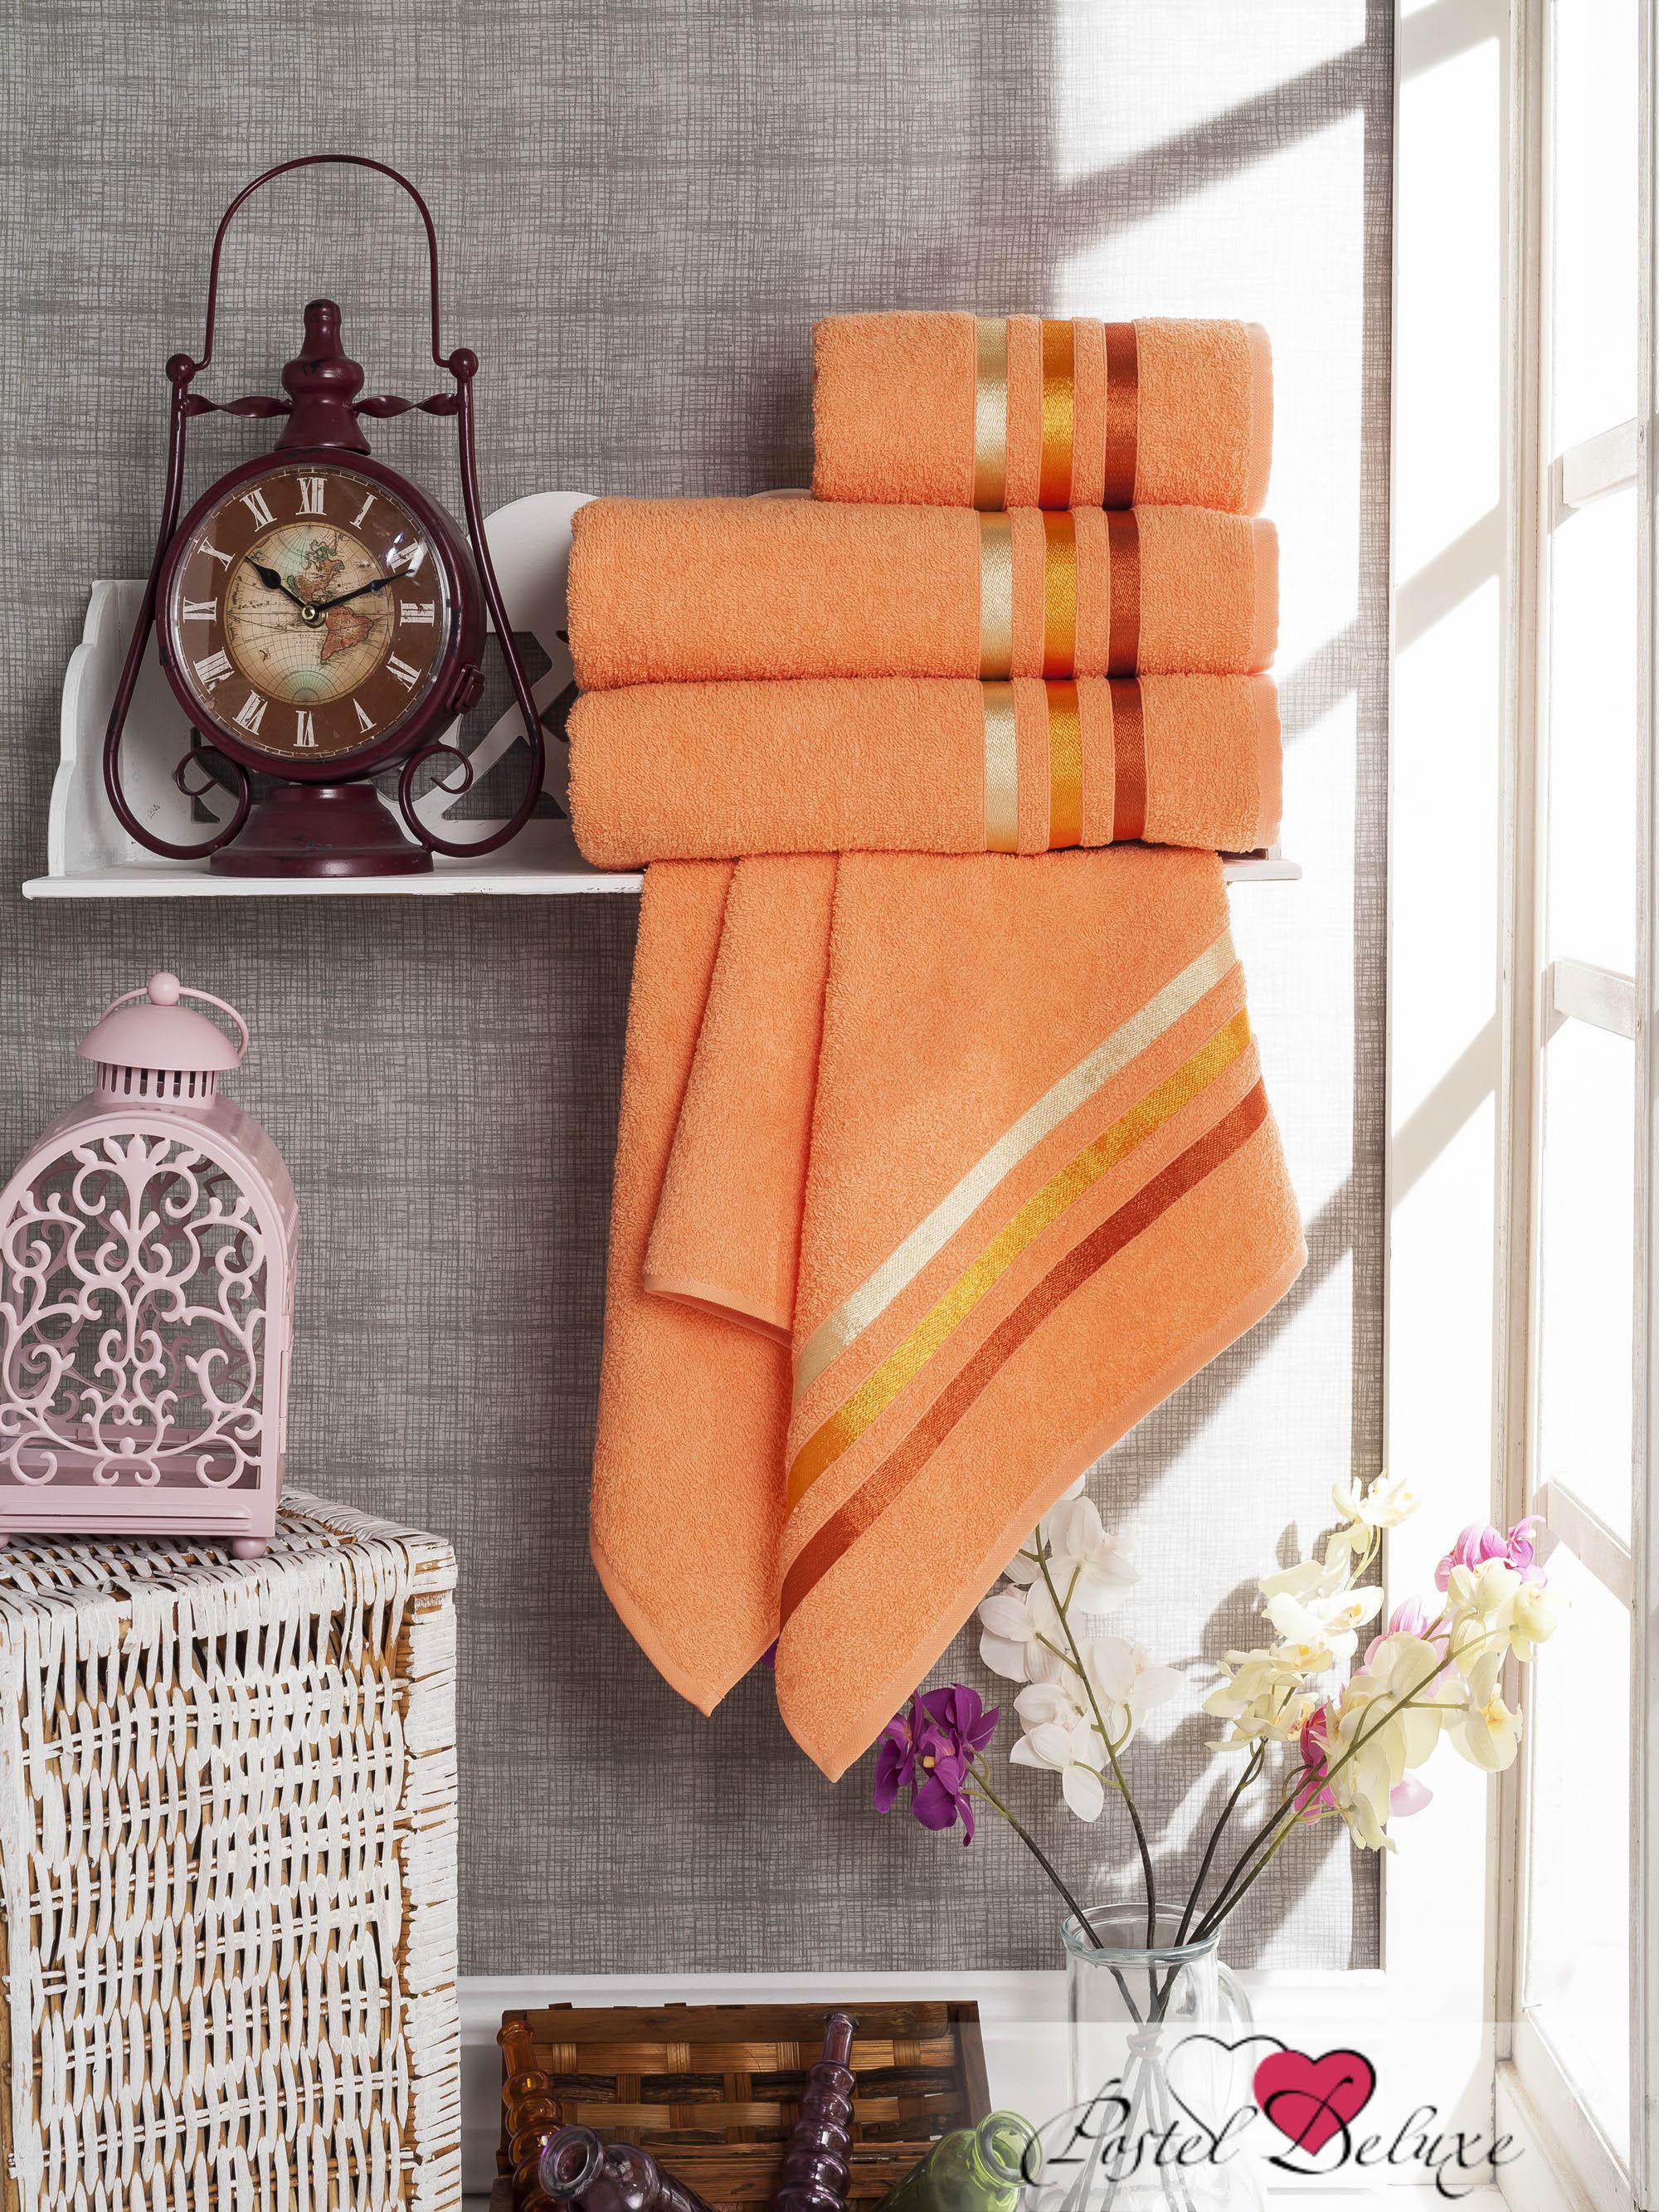 Полотенца Sokuculer Набор Полотенец Vevien Цвет: Персиковый набор из 3 полотенец merzuka sakura 50х90 2 70х140 8432 оранжевый